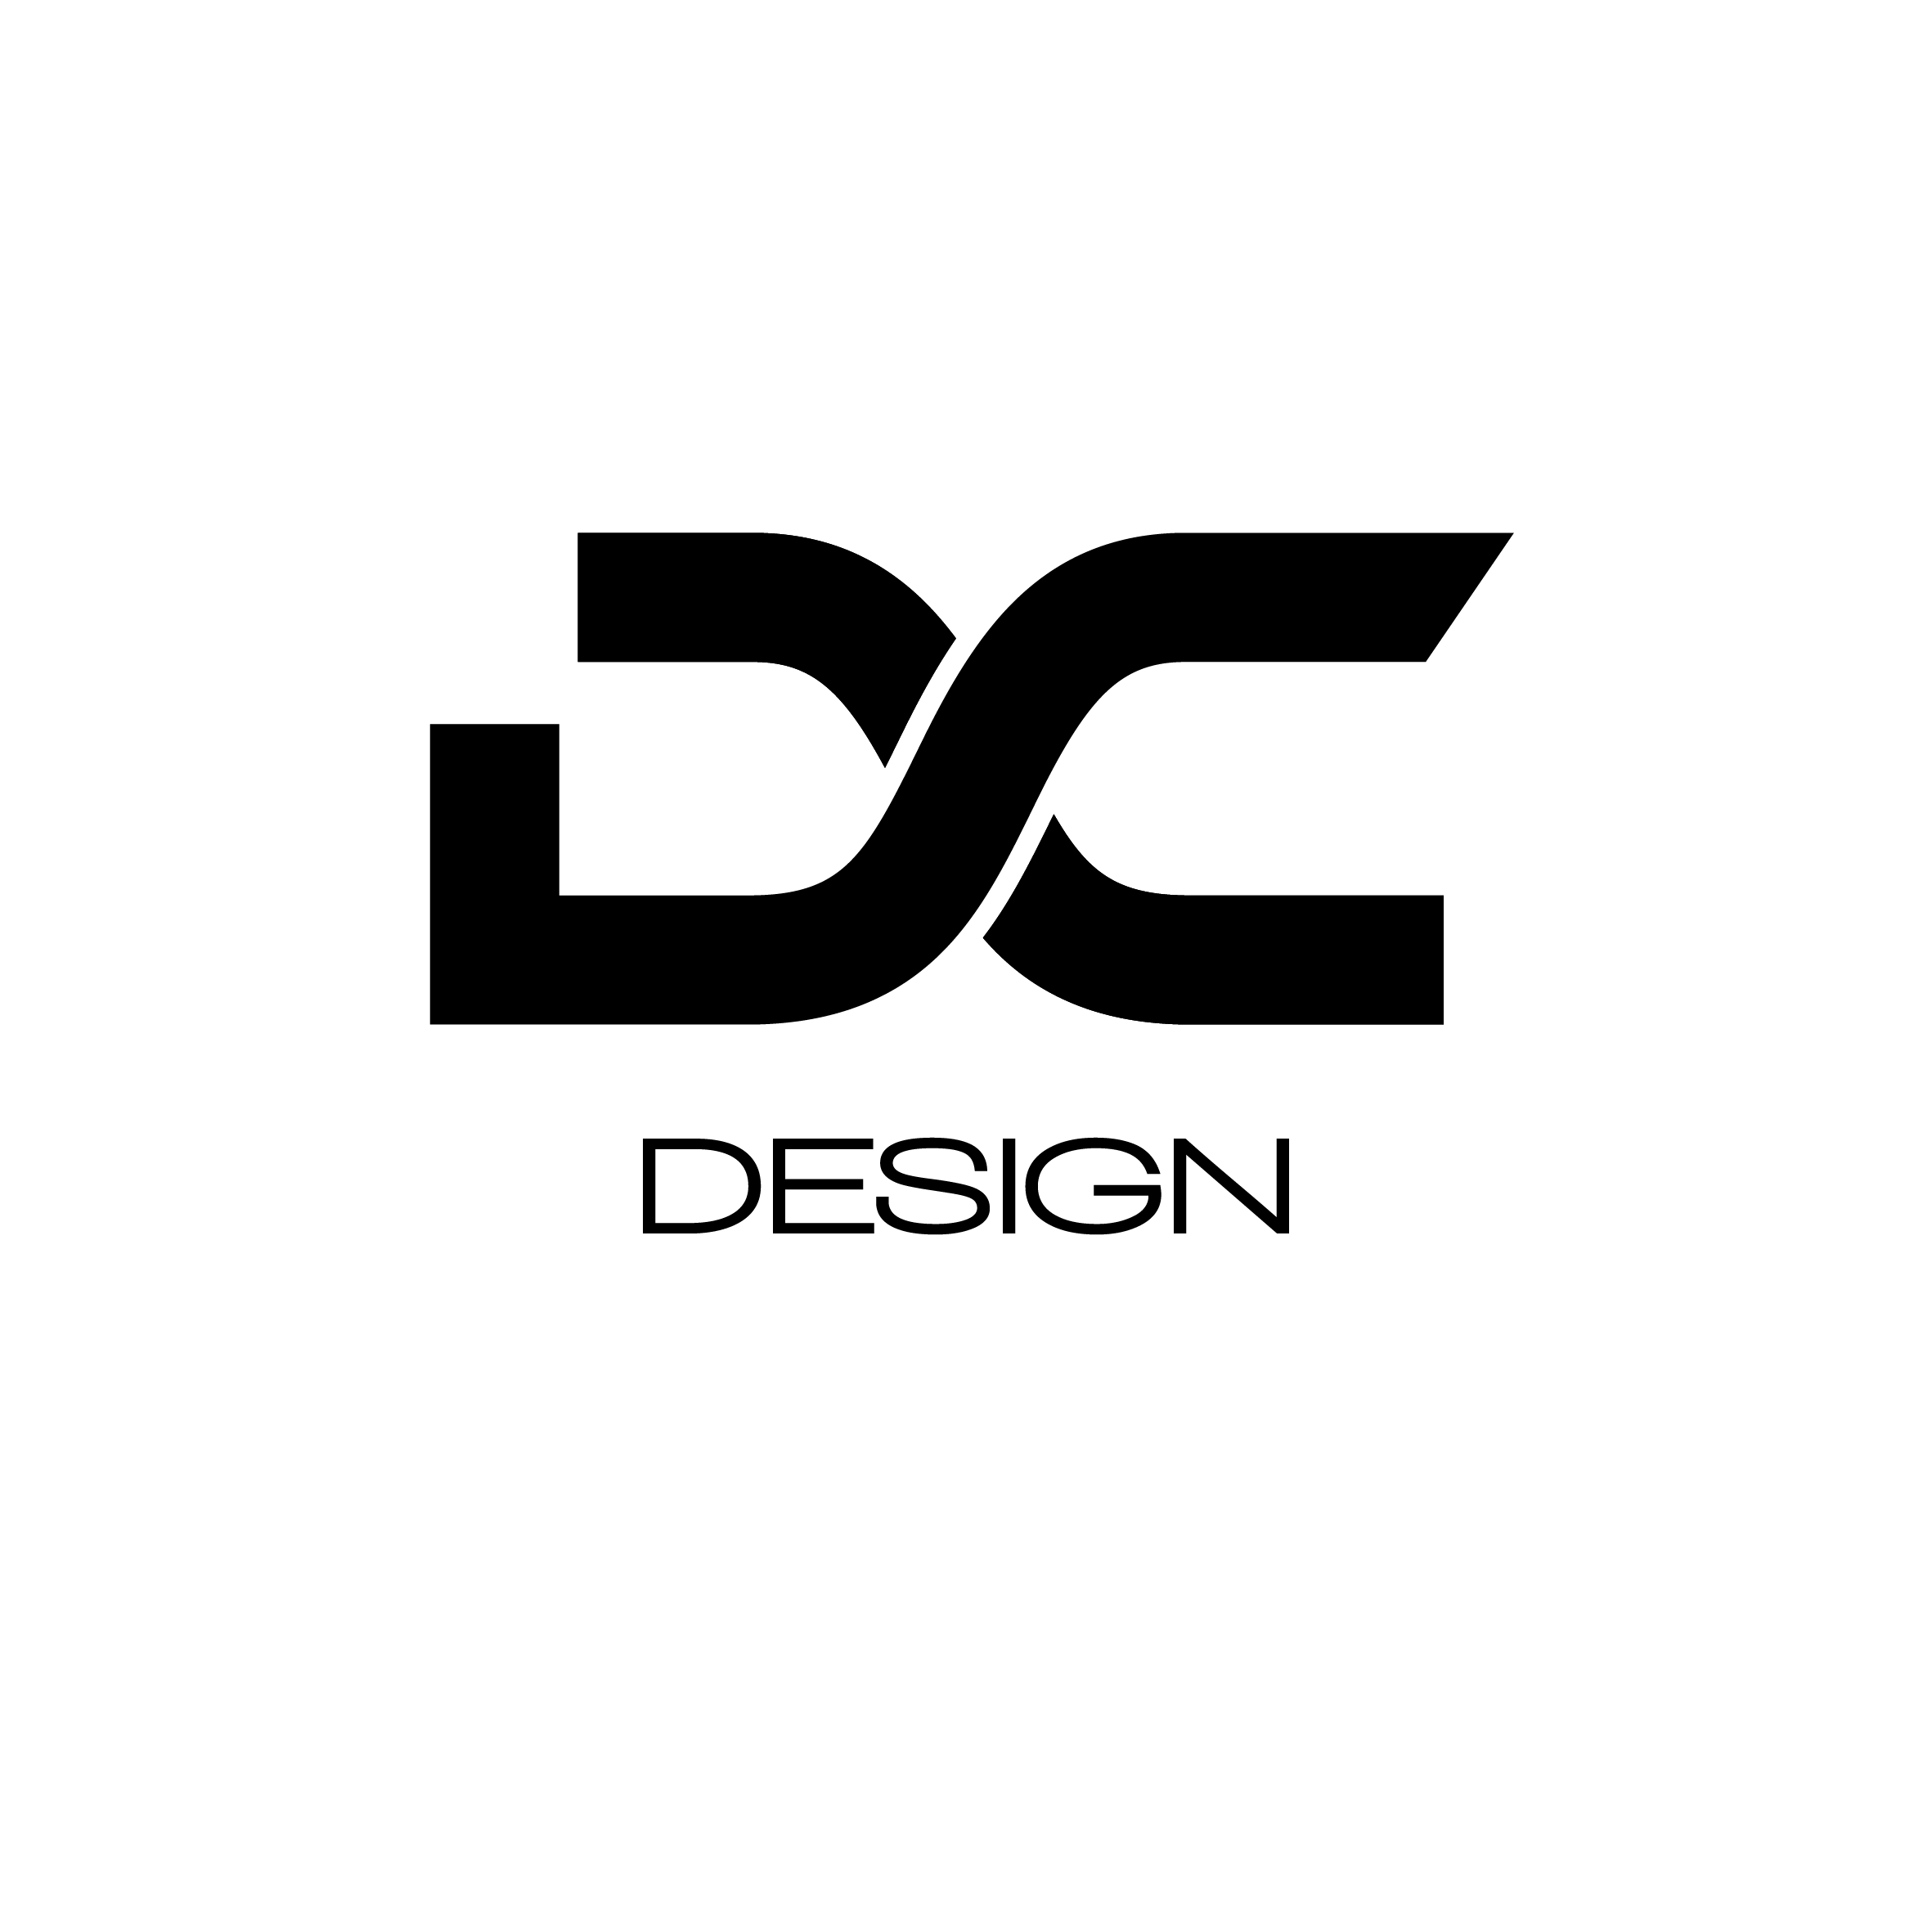 DC_Logos_Design_.png